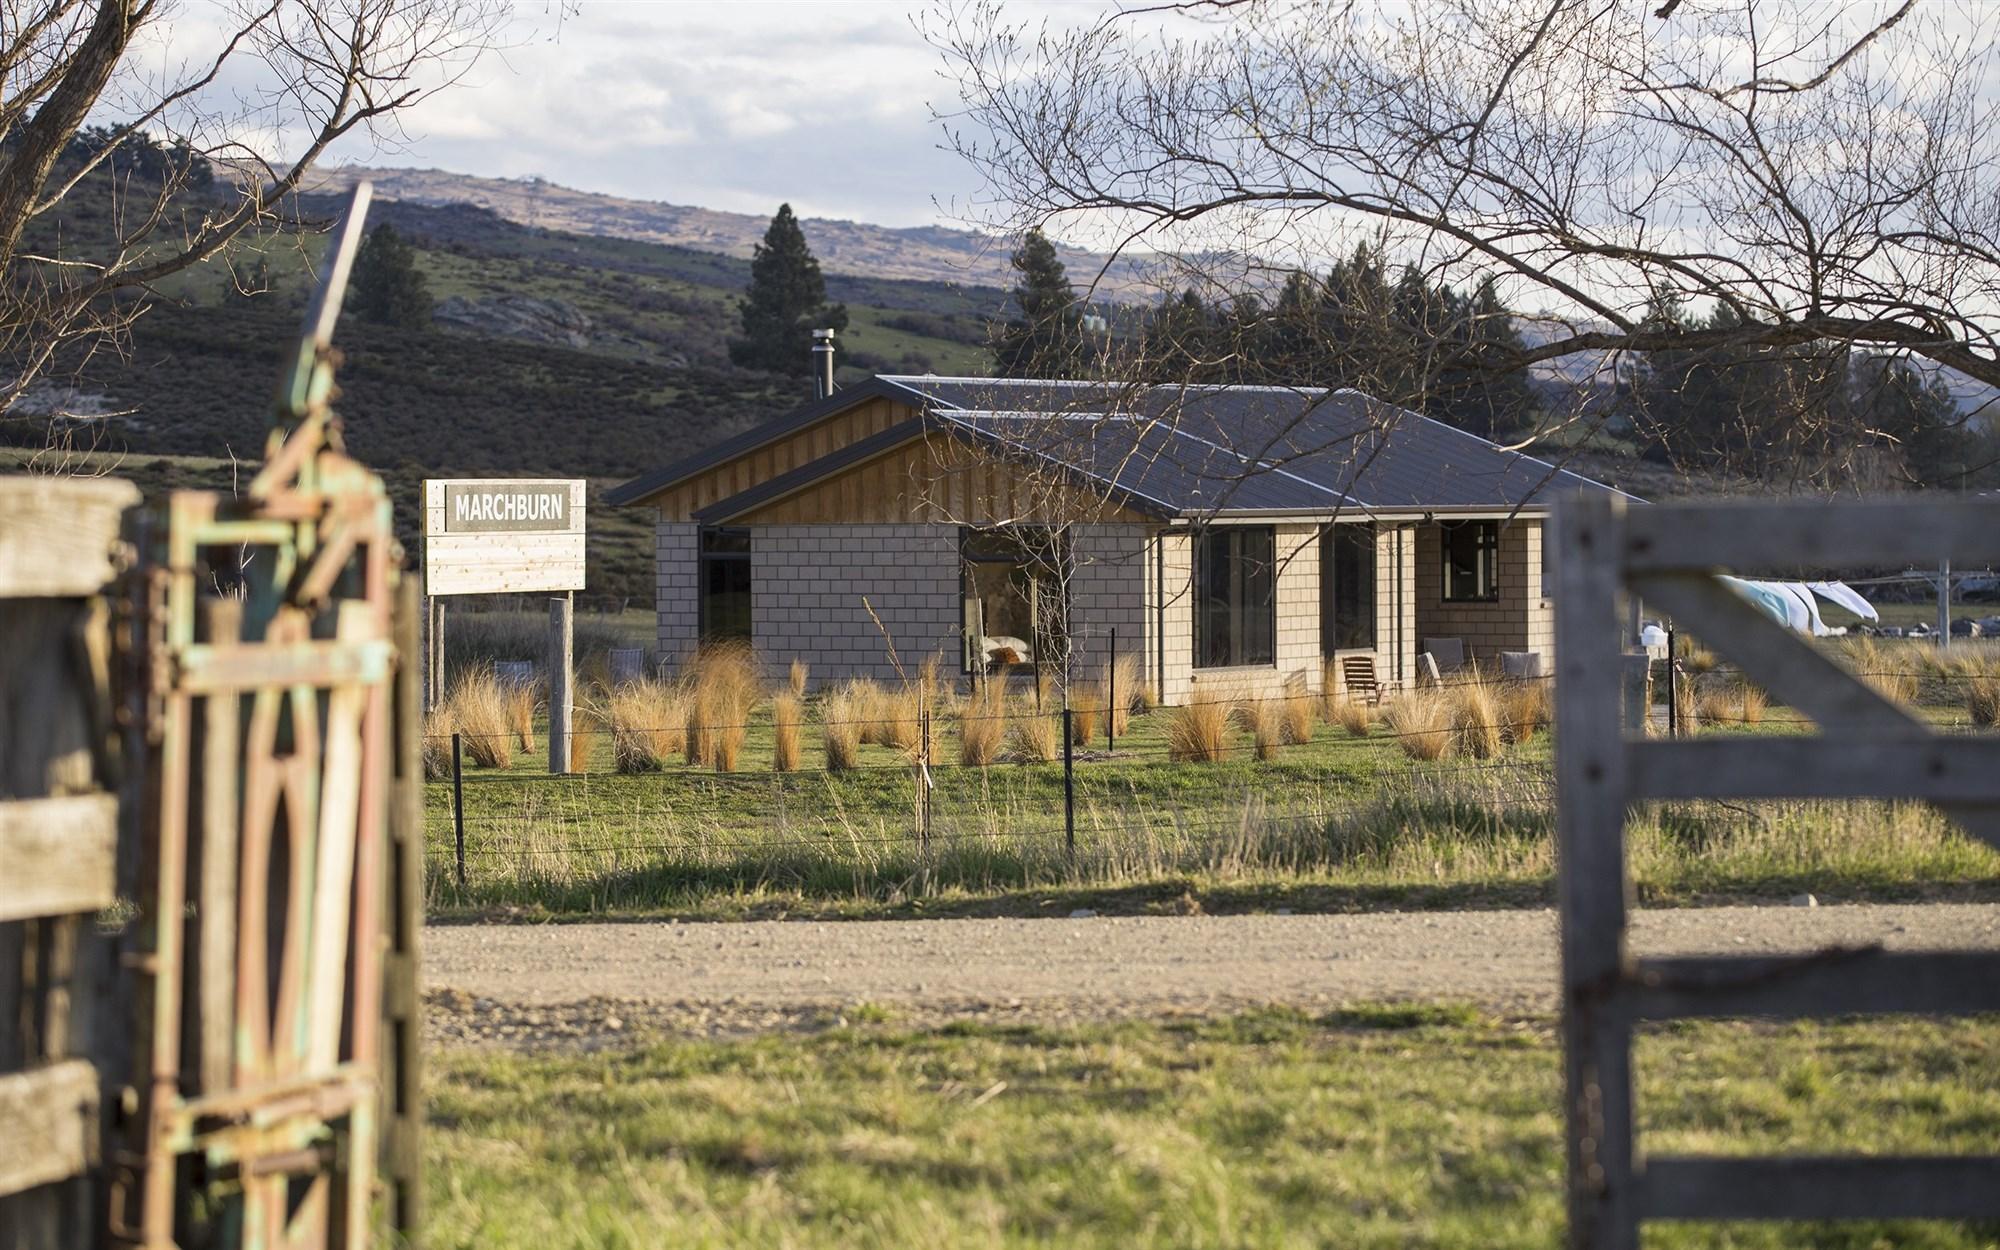 Marchburn Country Lodge, Central Otago